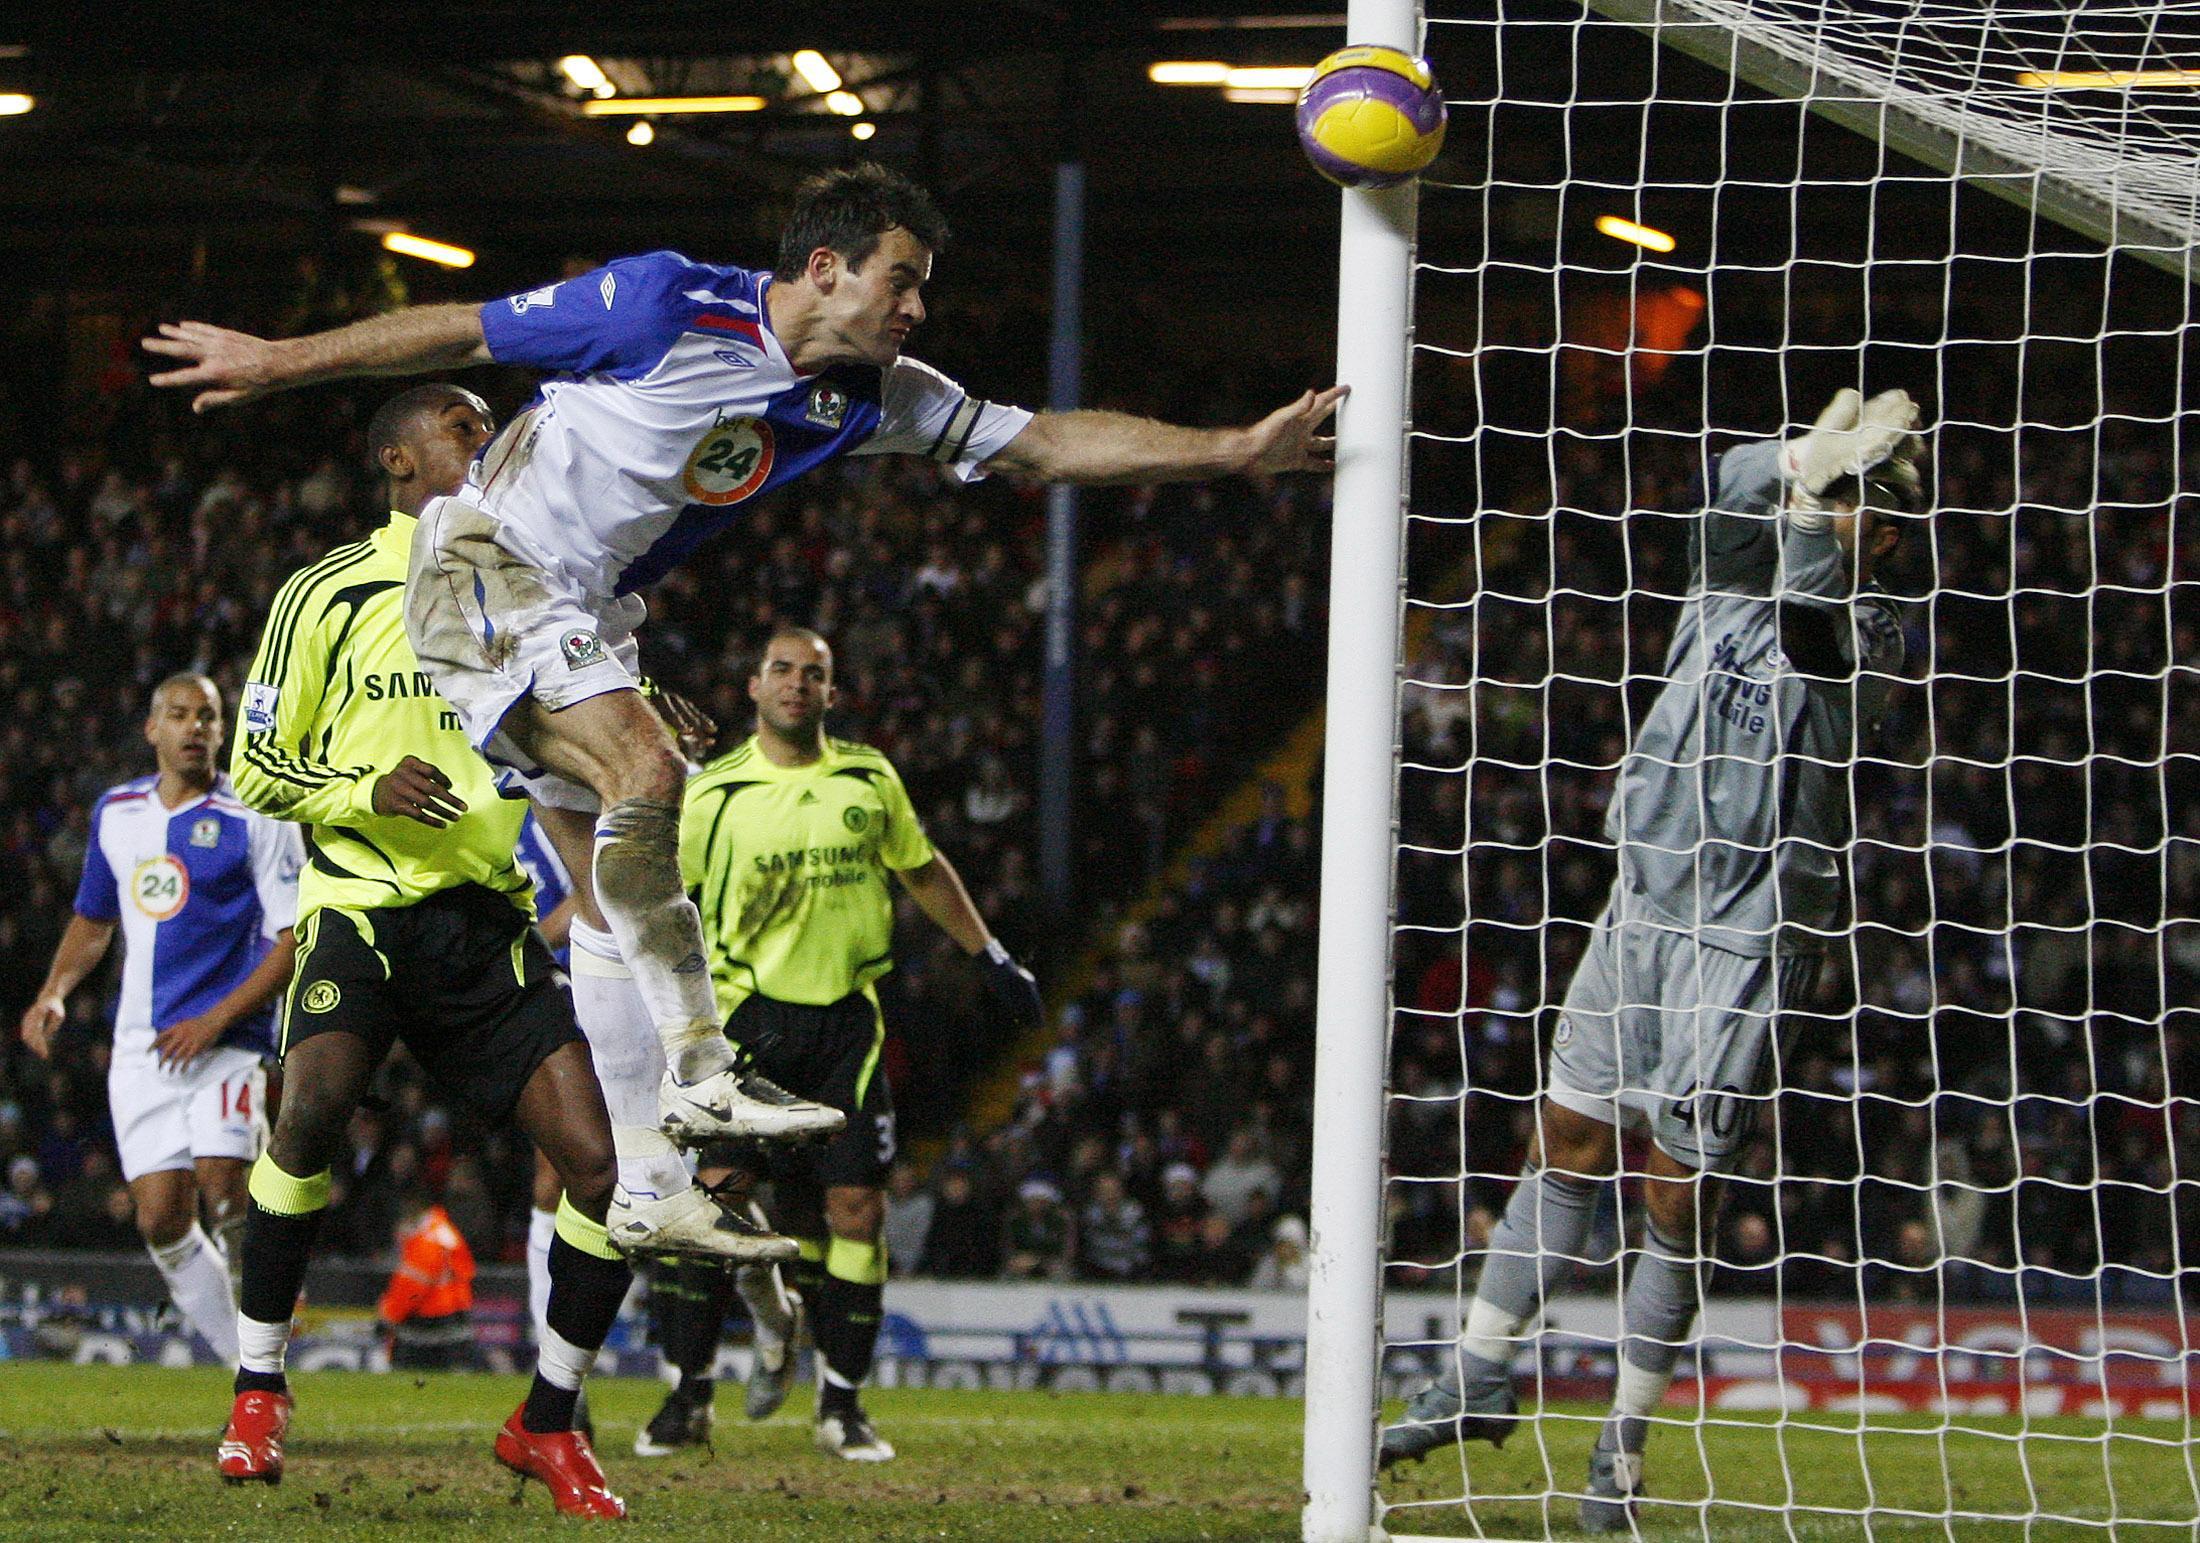 Blackburn Rovers Ryan Nelson heads the ball during their English Premier League soccer match against Chelsea in Blackburn, England on Sunday.